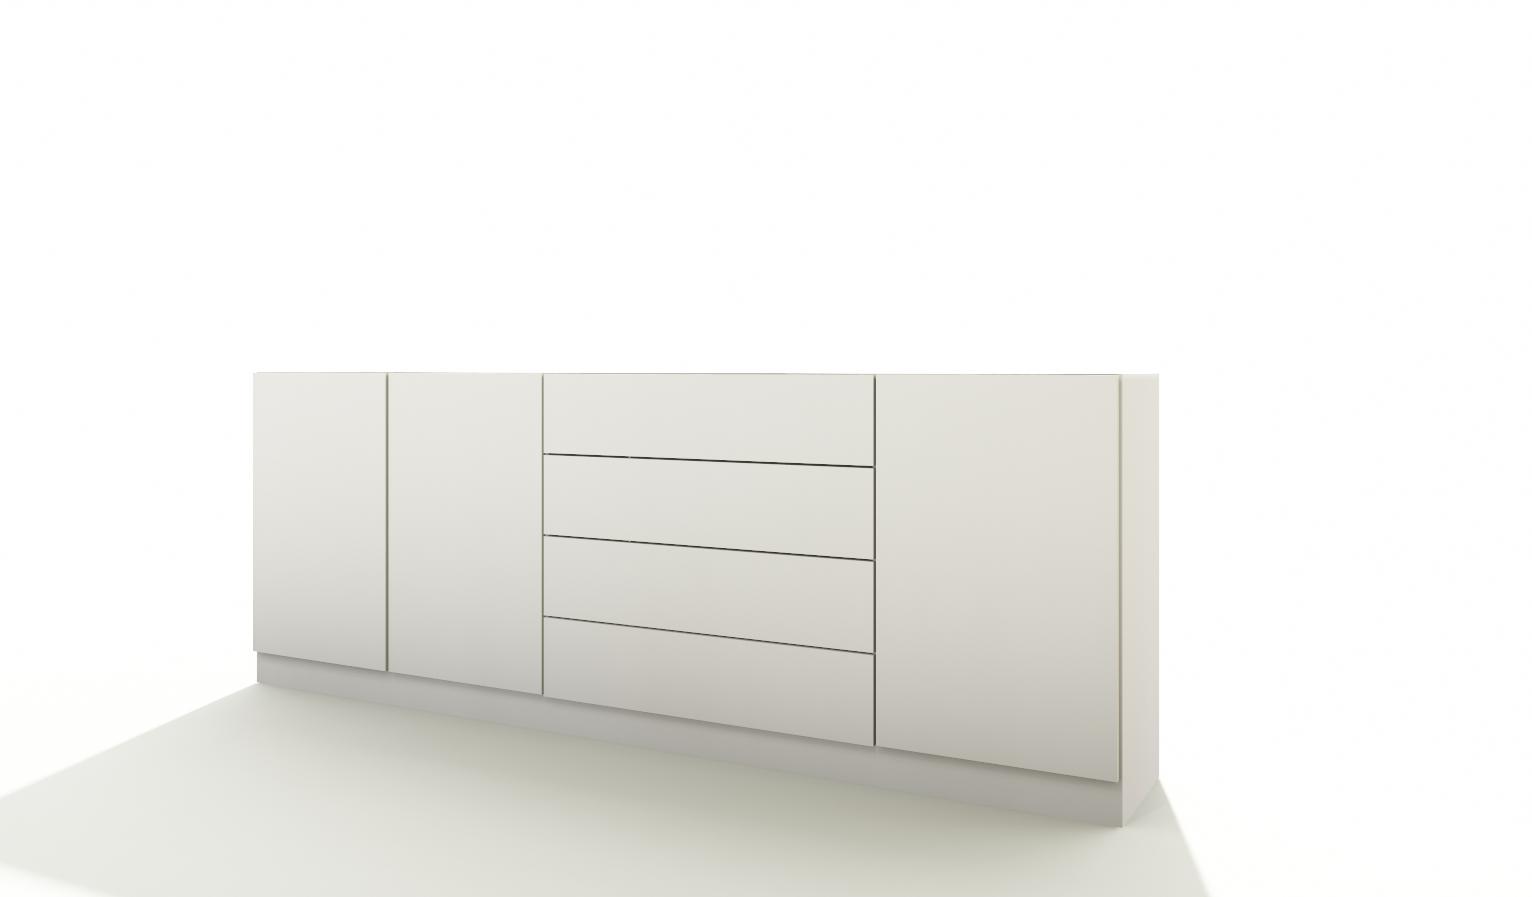 kommode v2 sideboard schrank anrichte push to open wei hochglanz matt 79cm ebay. Black Bedroom Furniture Sets. Home Design Ideas